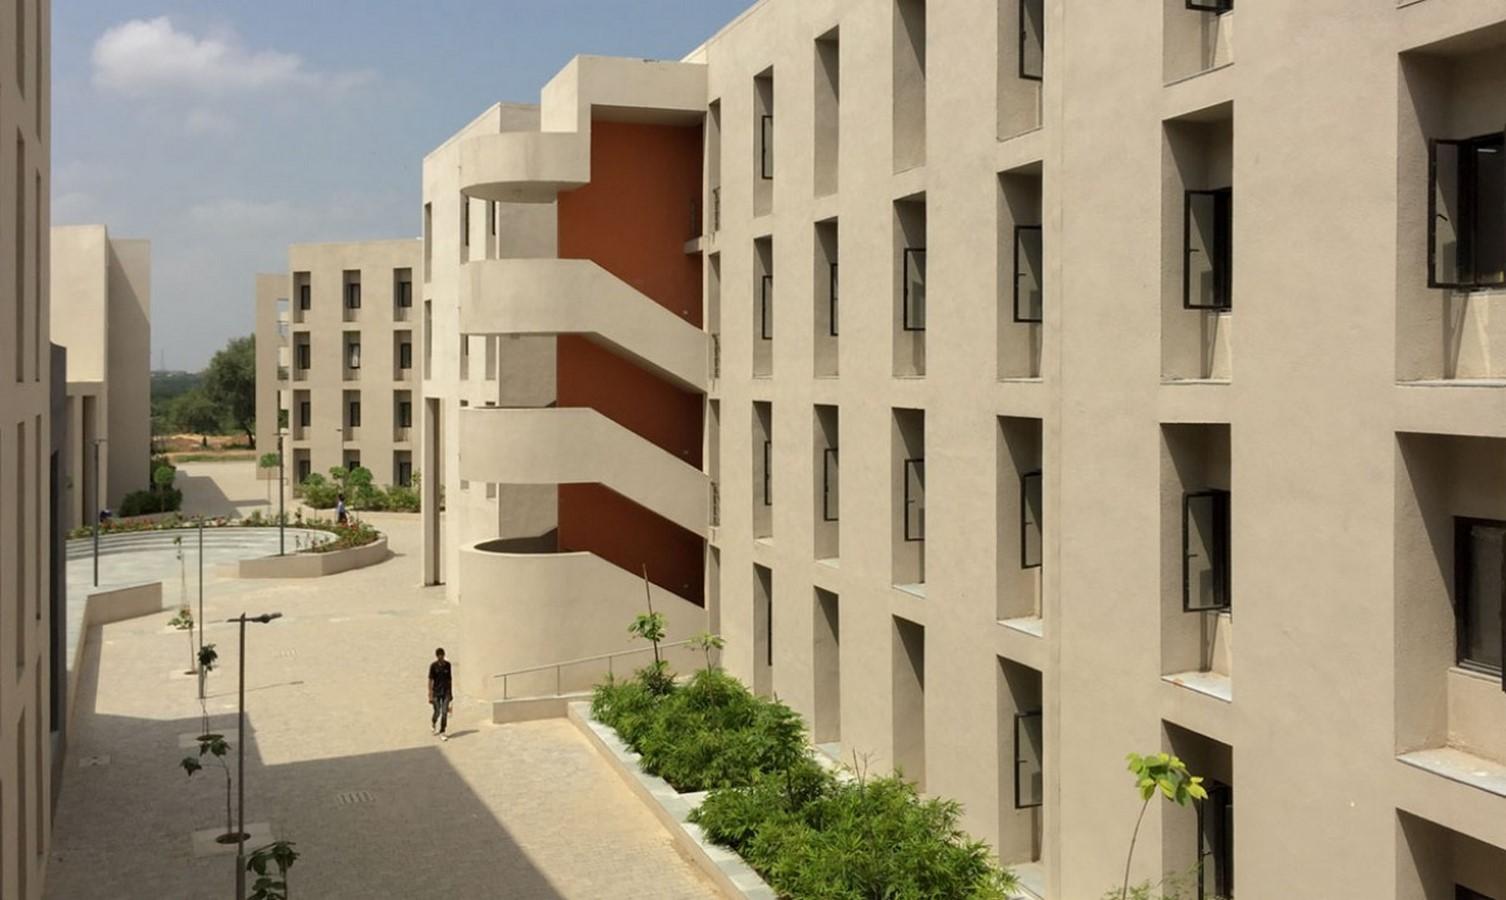 Architectural firms involved in designing the IIT Gandhinagar campus - Sheet6